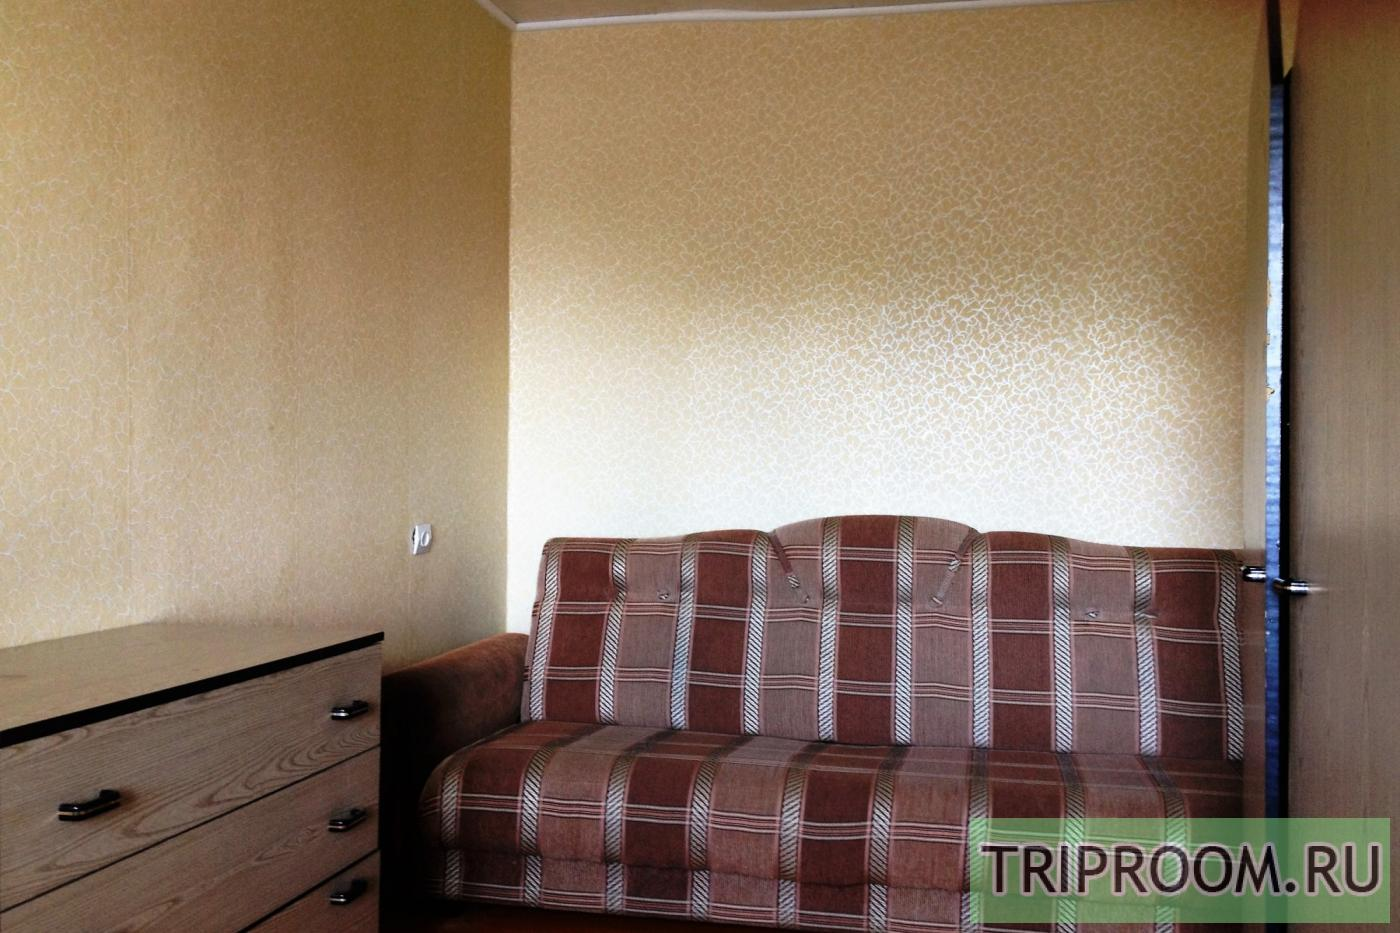 2-комнатная квартира посуточно (вариант № 27830), ул. Революции улица, фото № 4